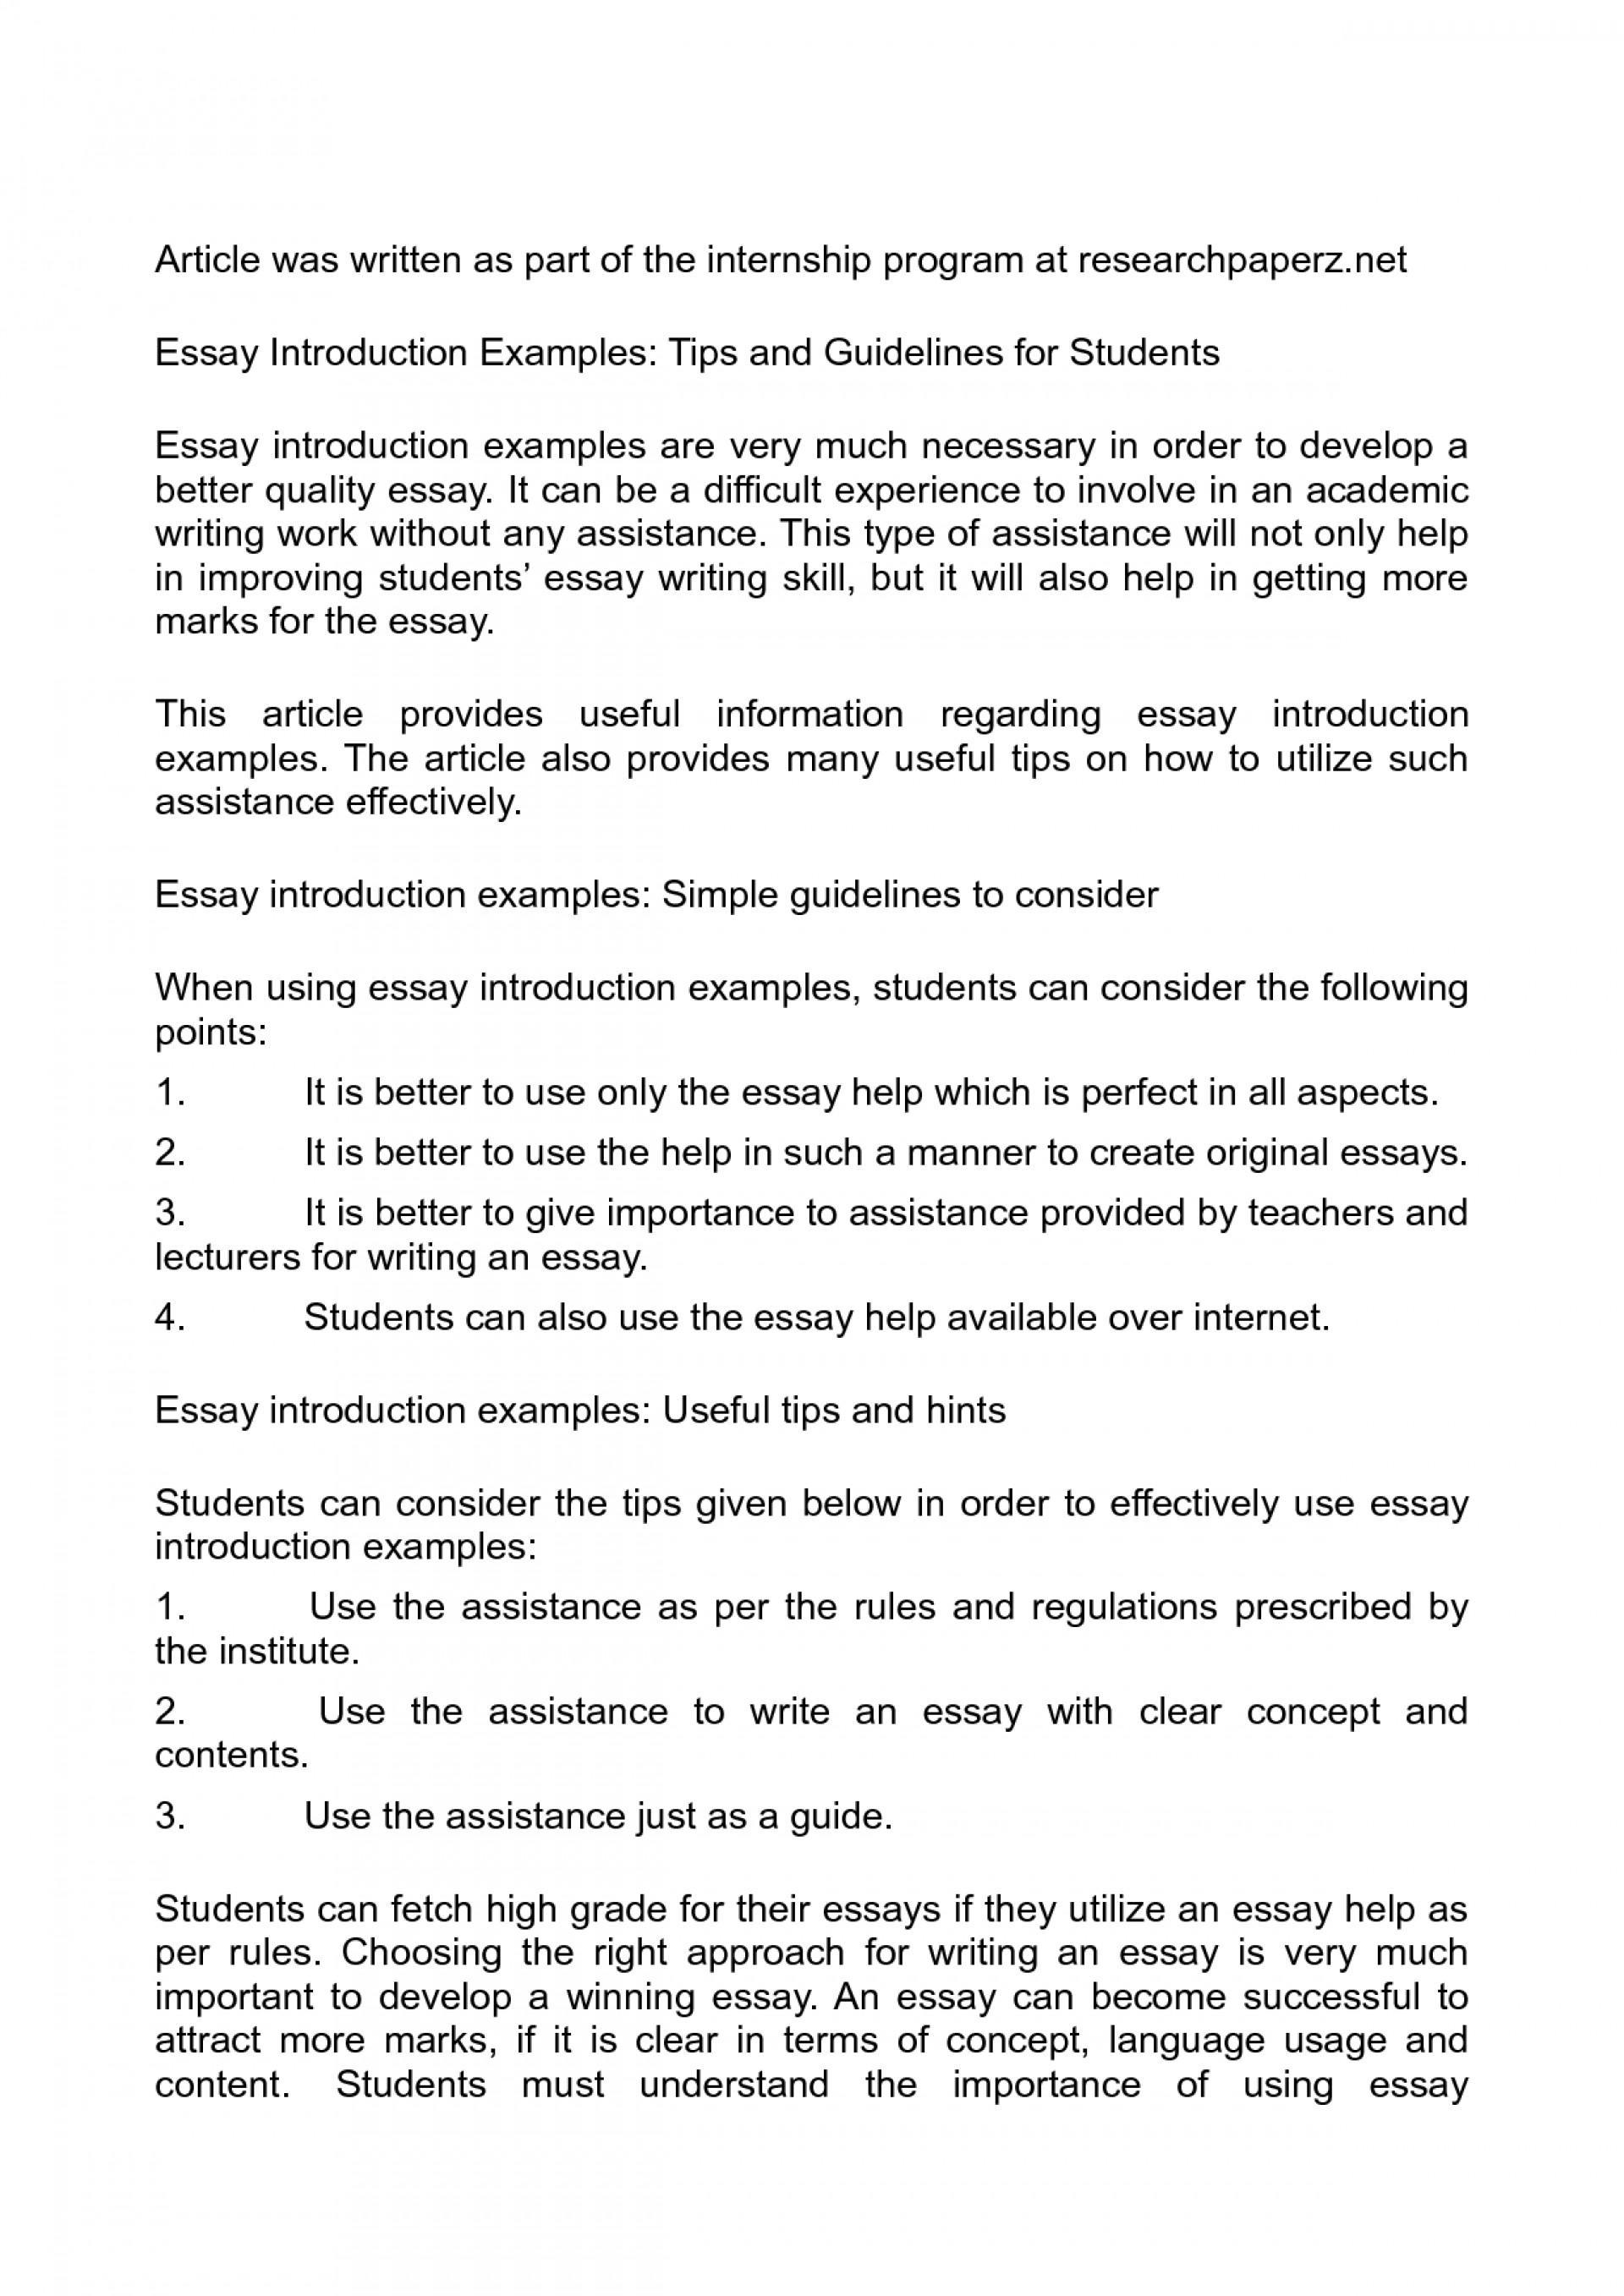 002 Essay Example Introduction Samples Frightening Sample Tagalog Argumentative Format Template 1920